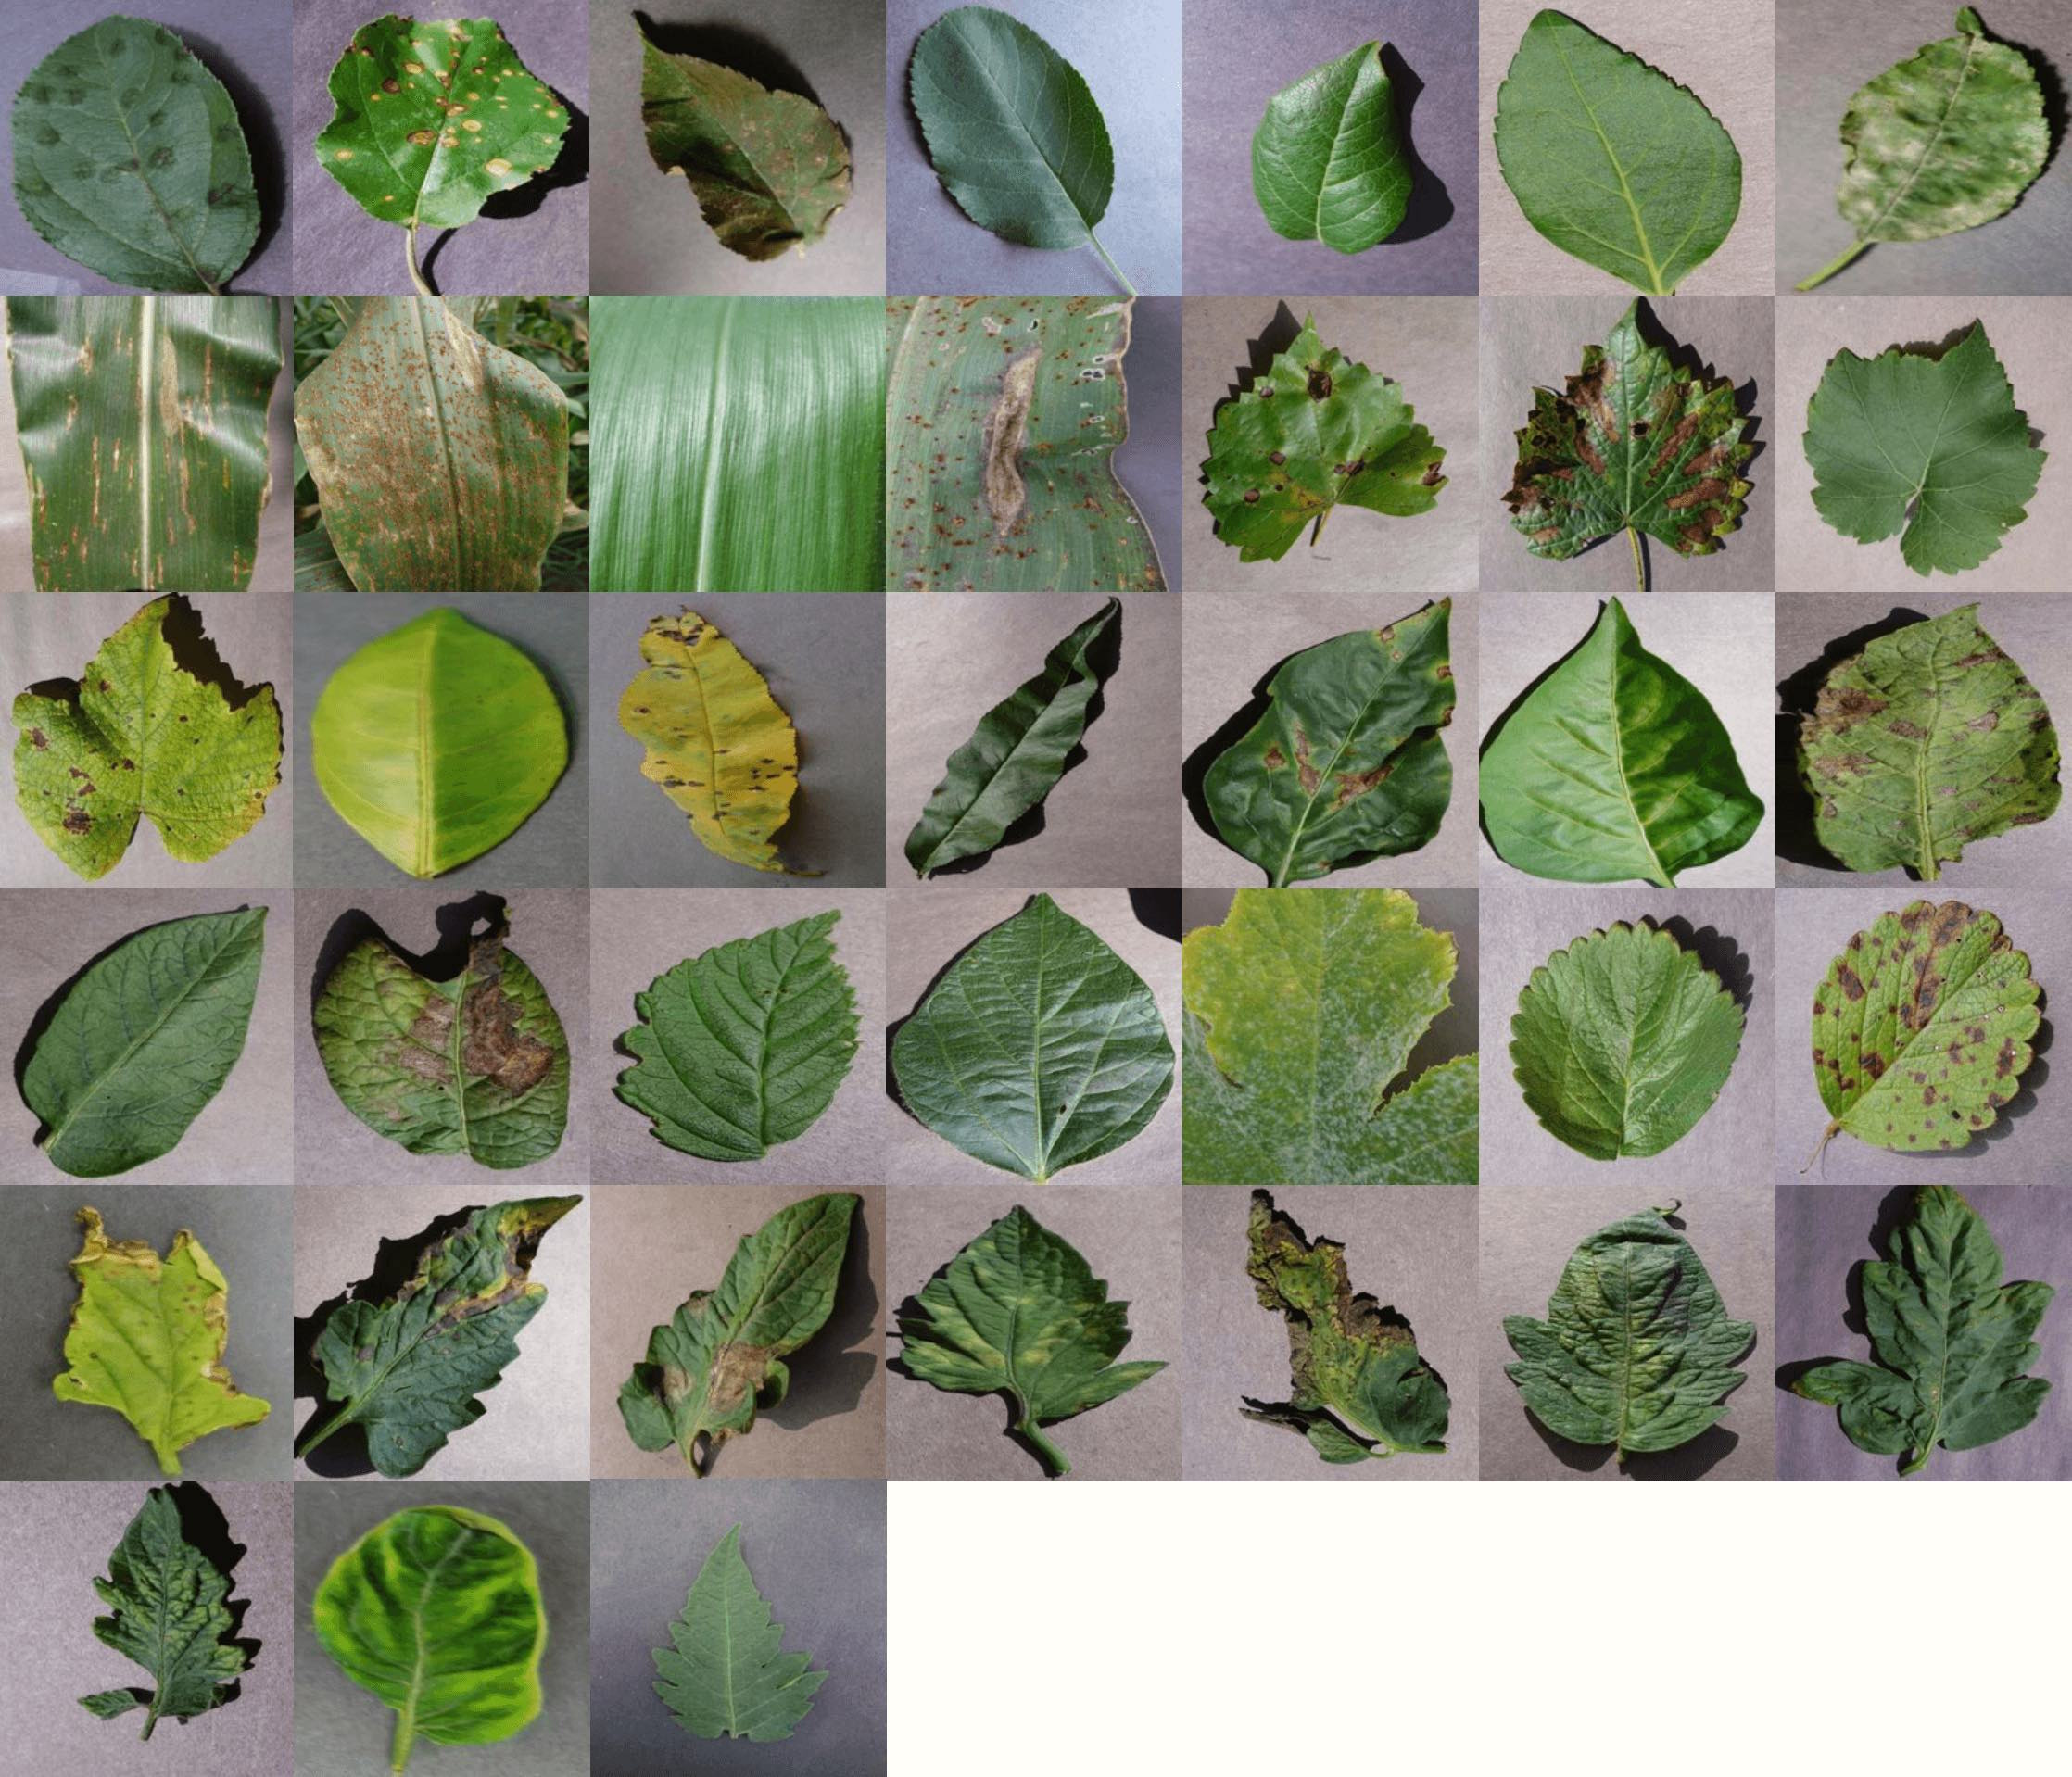 38 classes of crop-disease pairs in the dataset